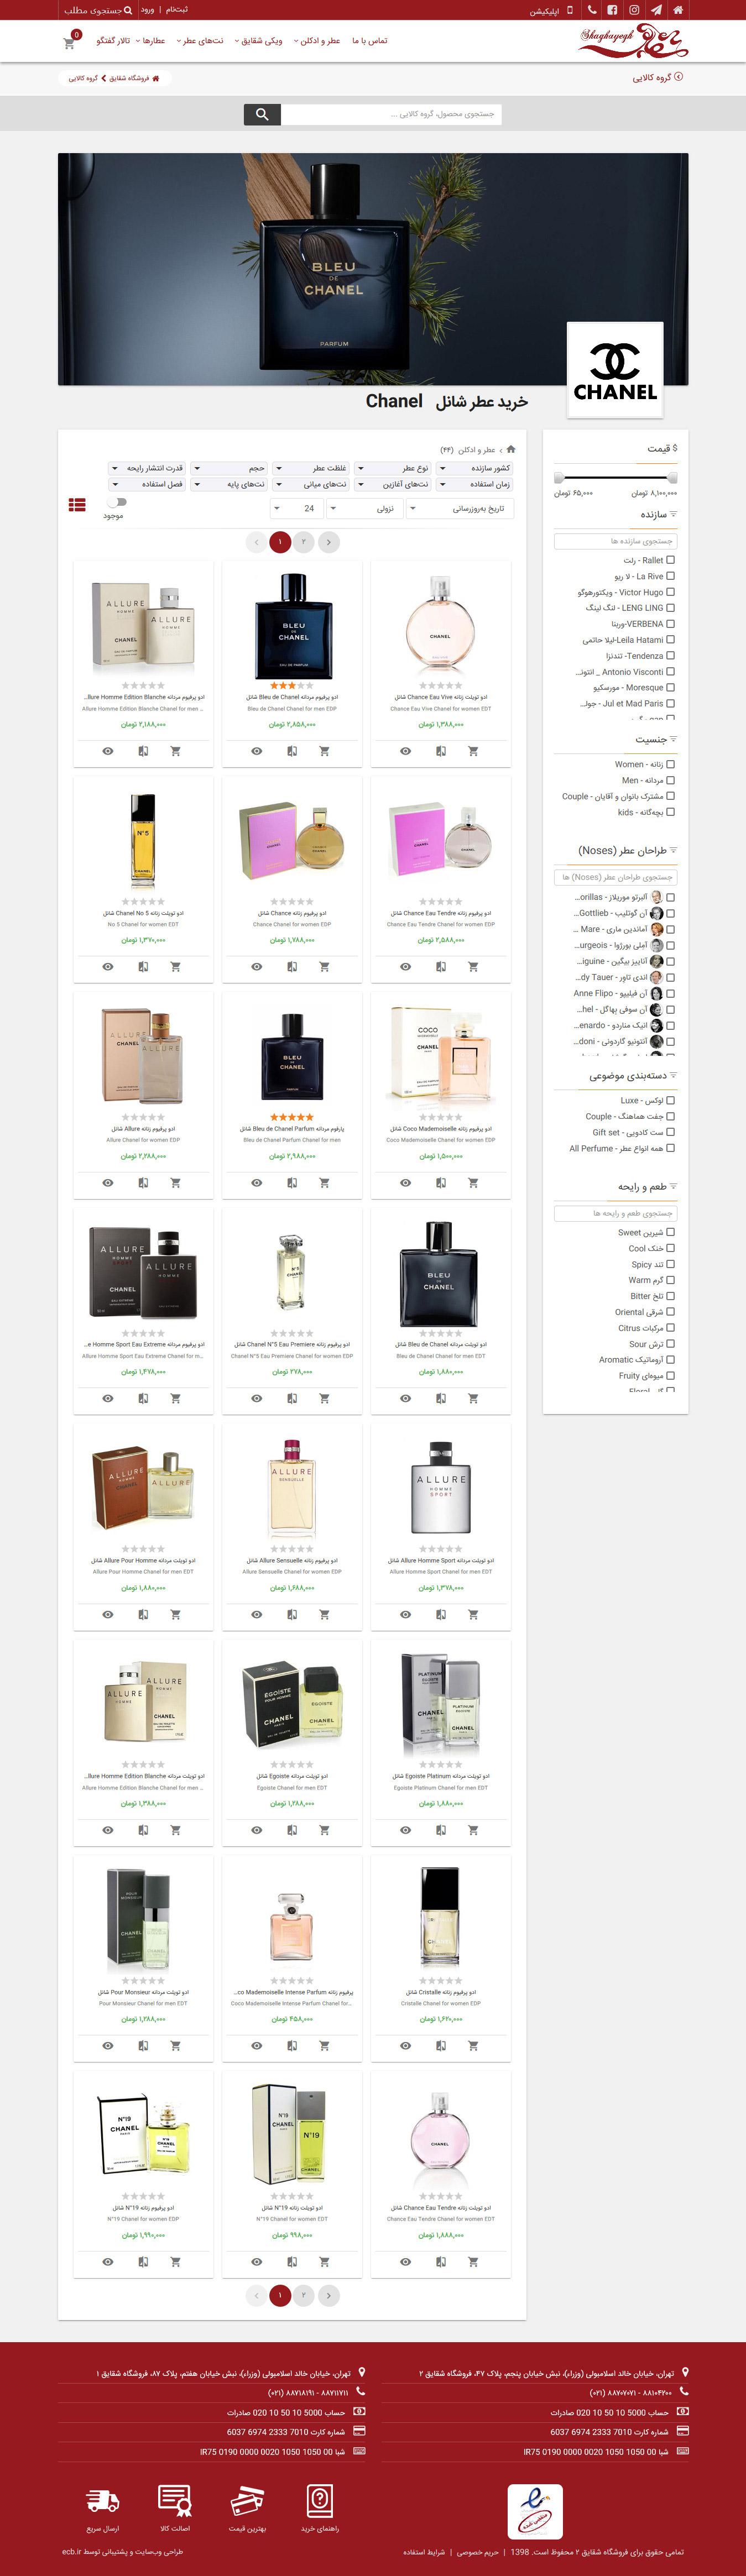 shaghayegh2-com-ProductList-by-Brand